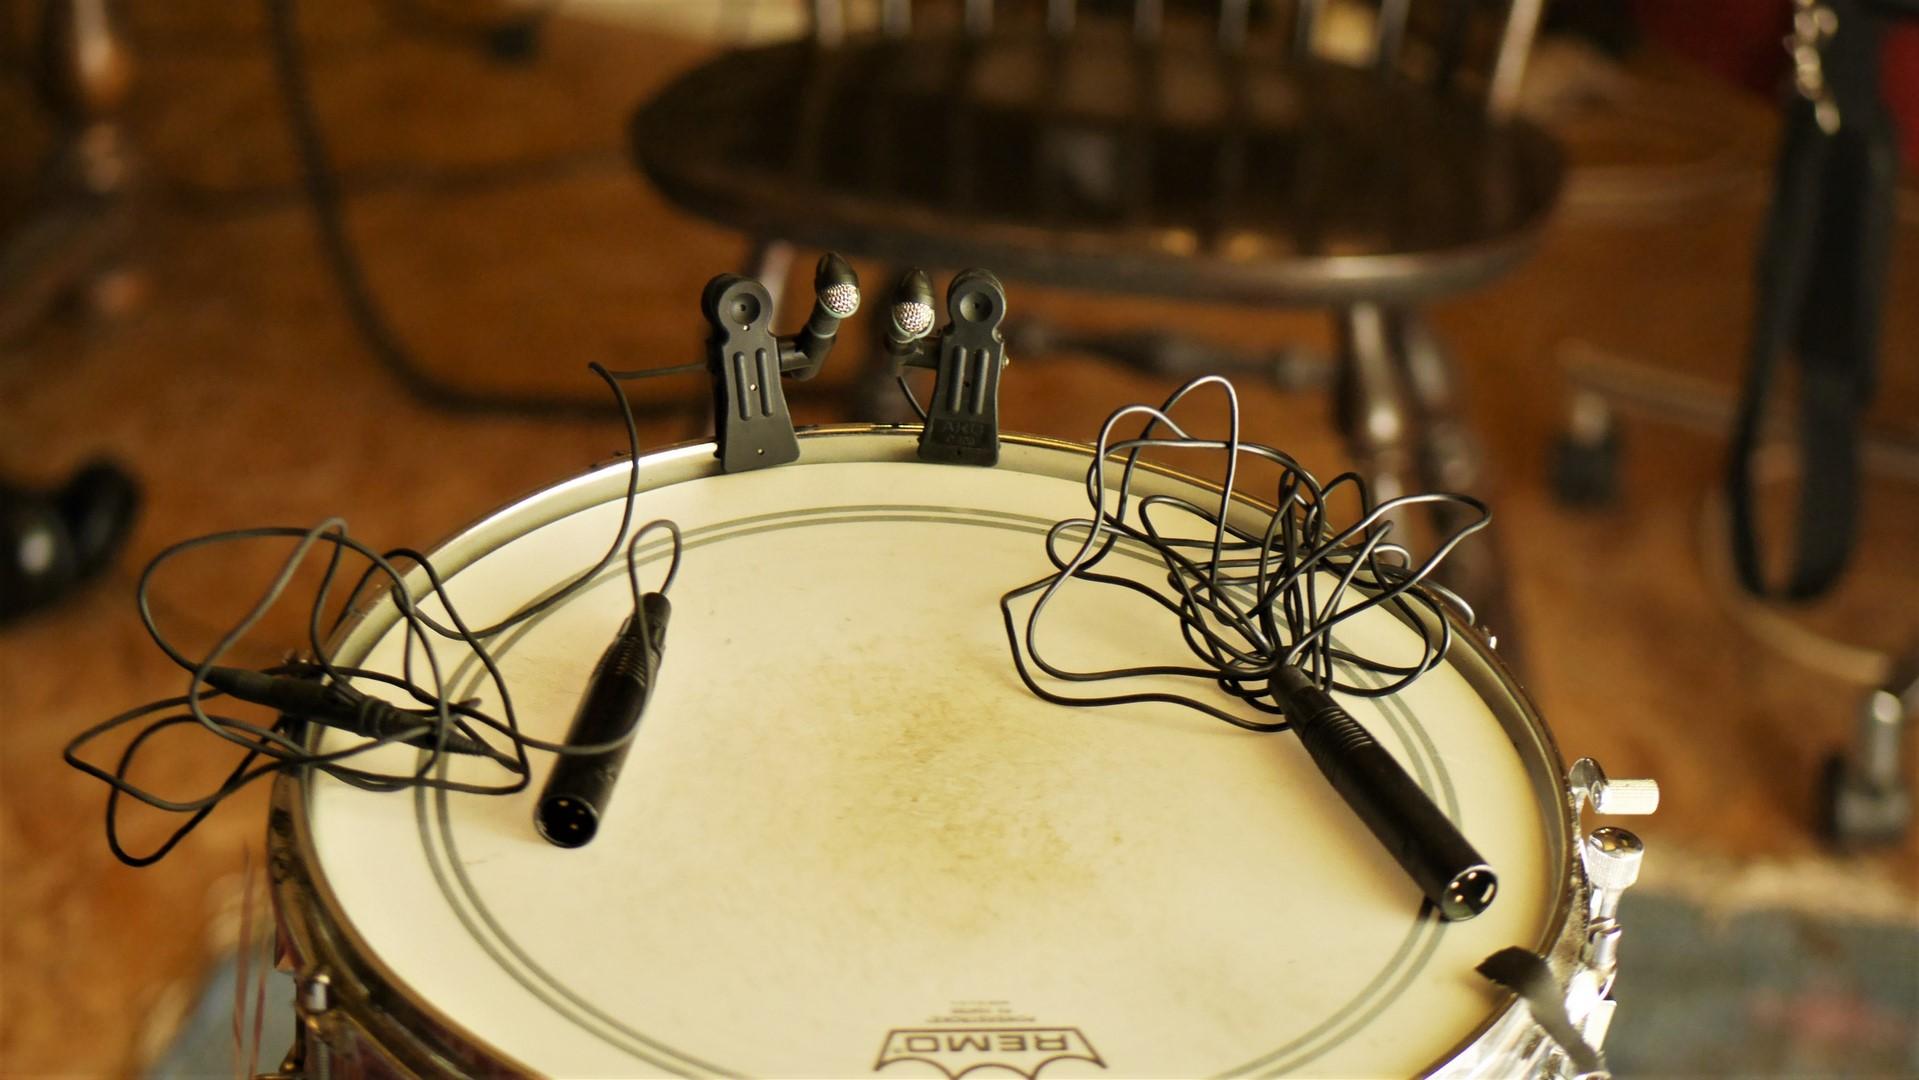 studio-la-boite-a-meuh-2e-akg-c408